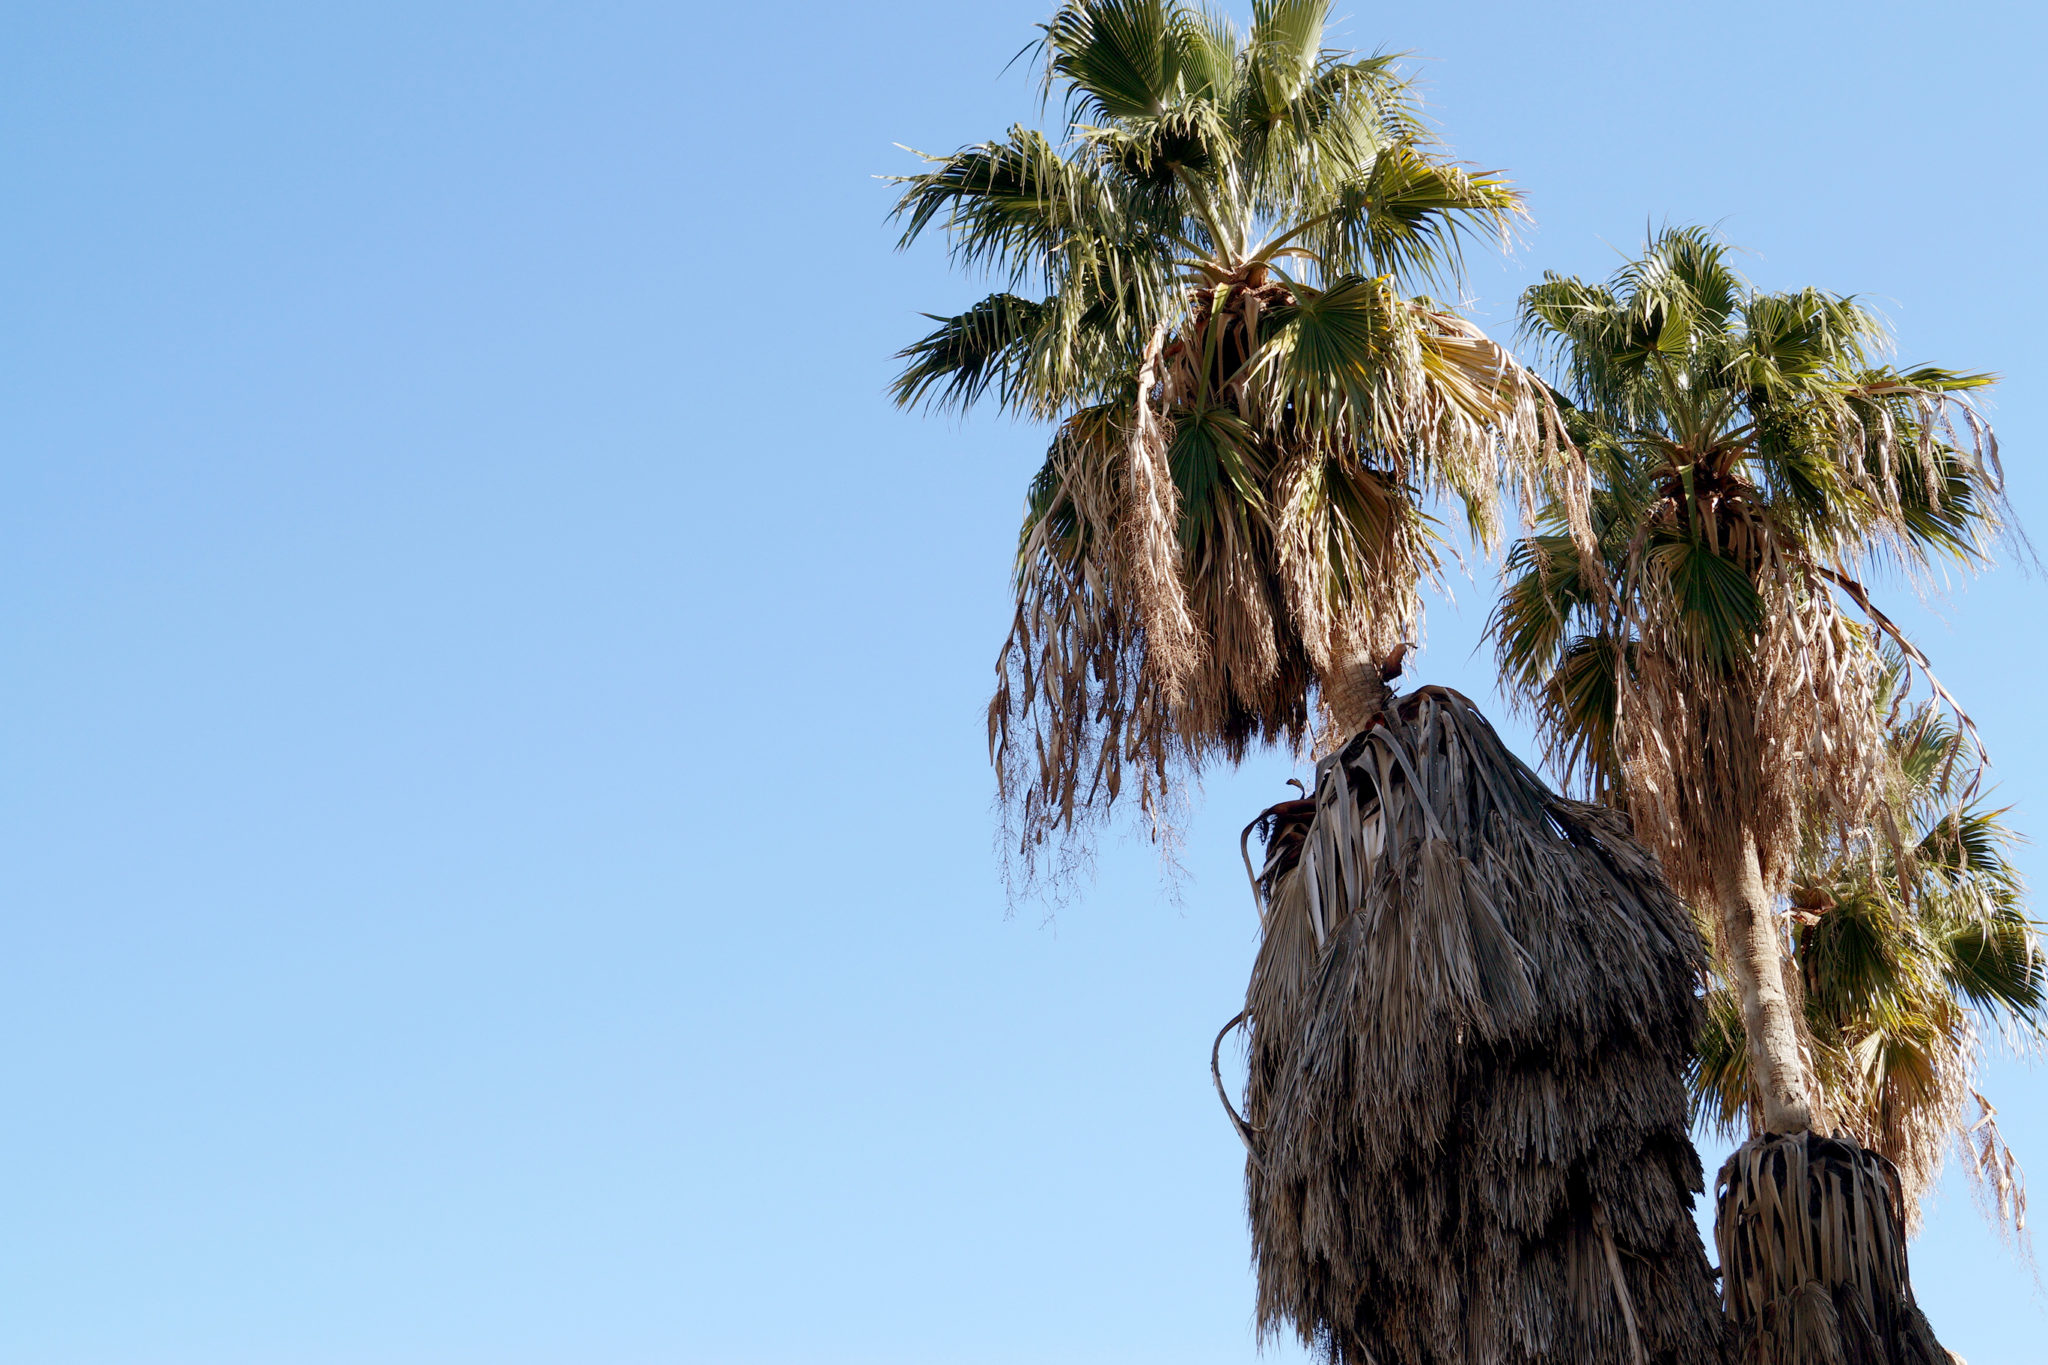 Libanon-Sehenswuerdigkeiten-Palmen